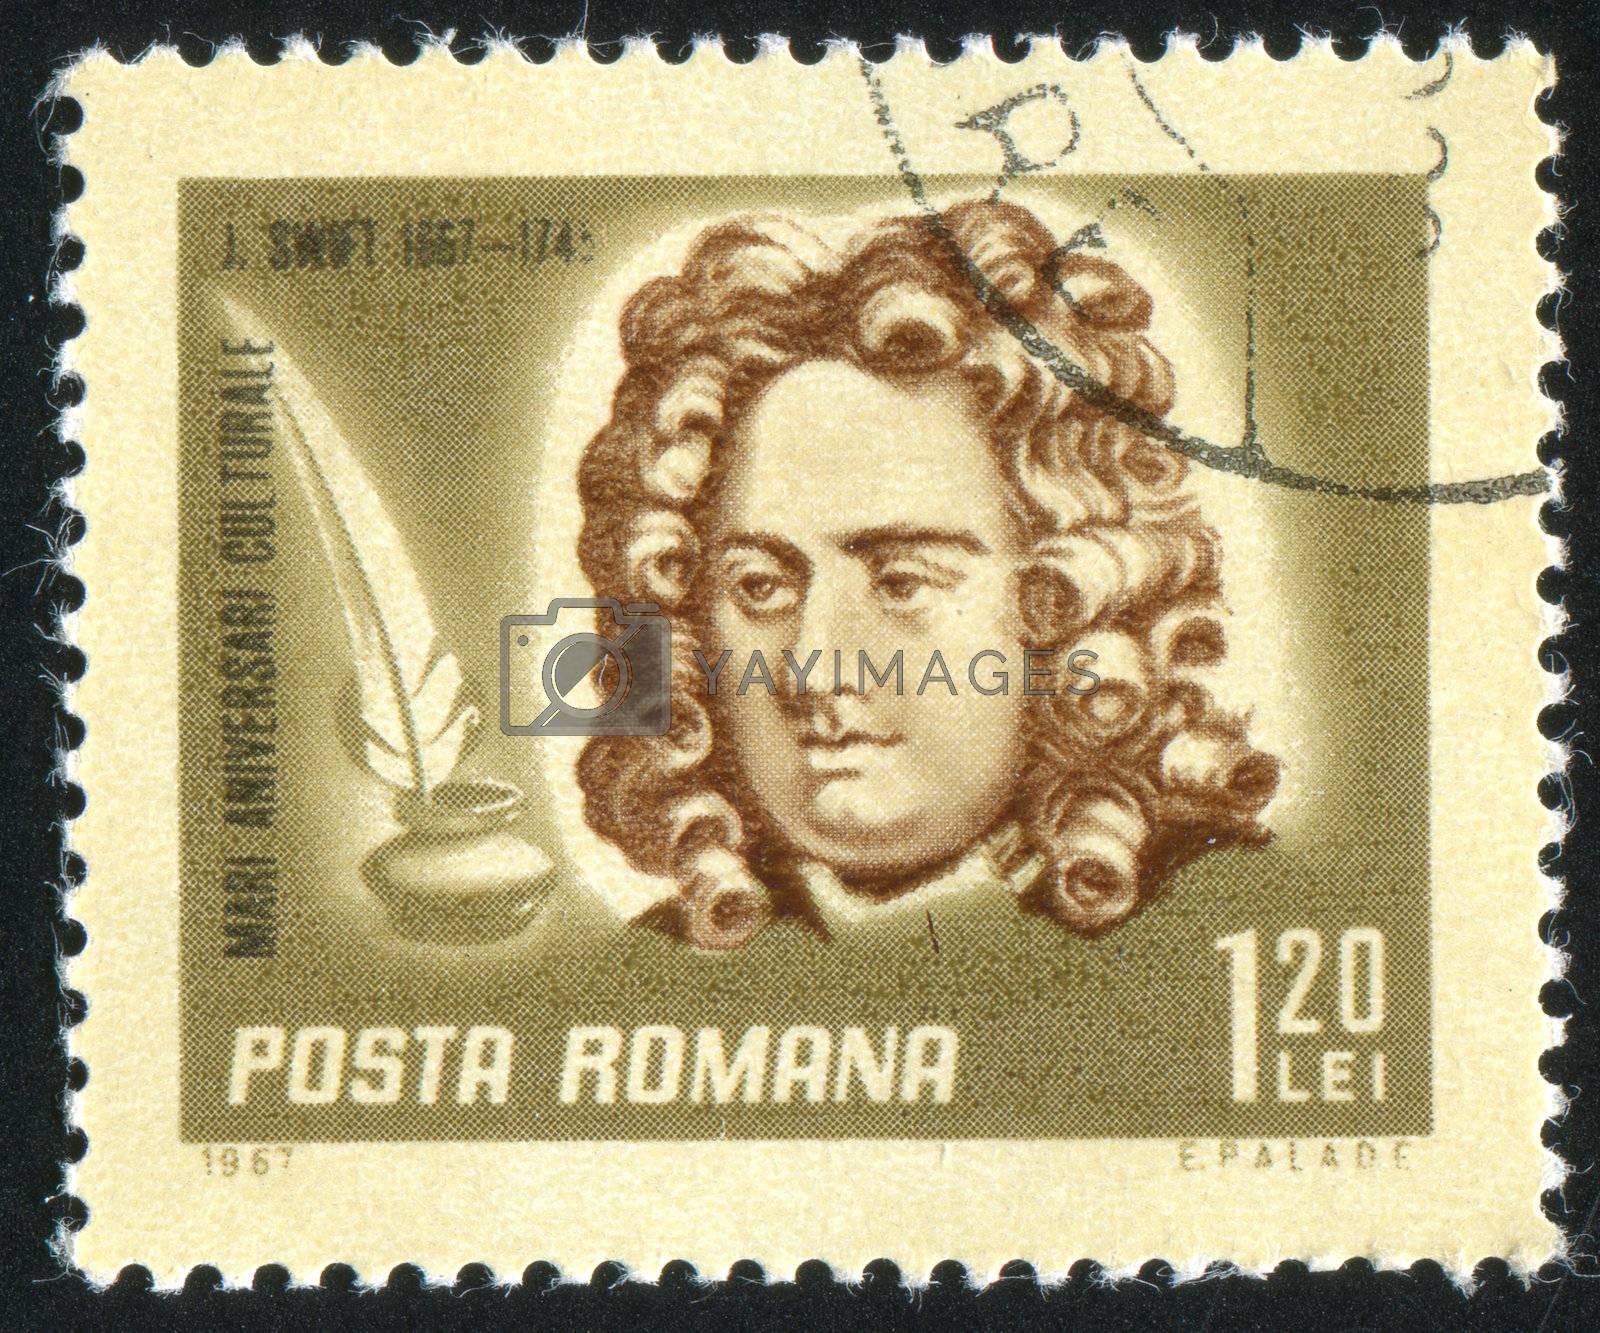 ROMANIA - CIRCA 1967: stamp printed by Romania, show Jonathan Swift, writer, circa 1967.